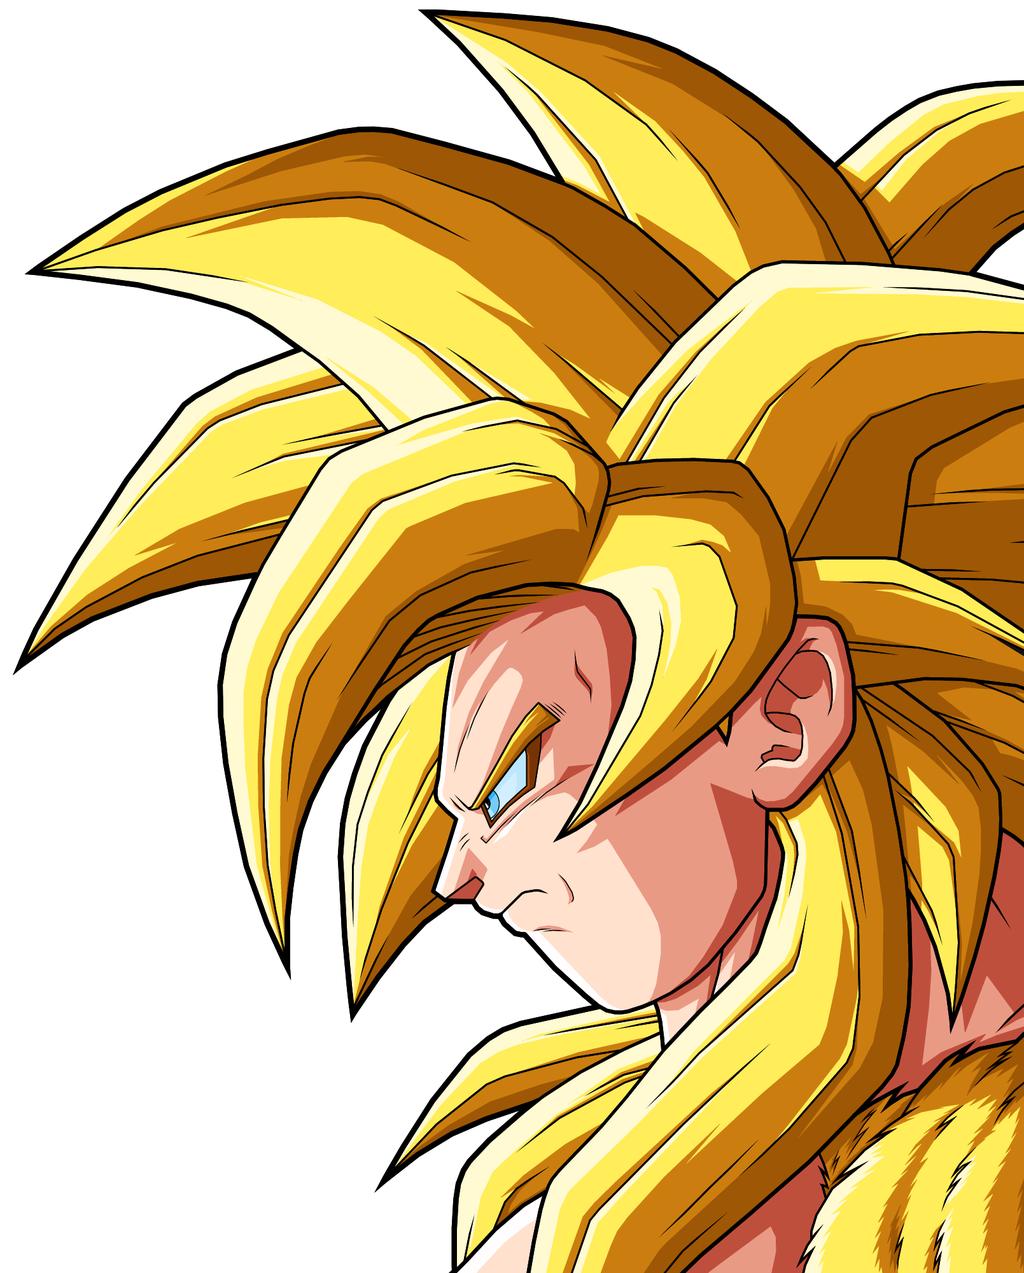 Goku Ssj5 By Drozdoo On Deviantart Dragon Ball Art Goku Super Saiyan Goku Super